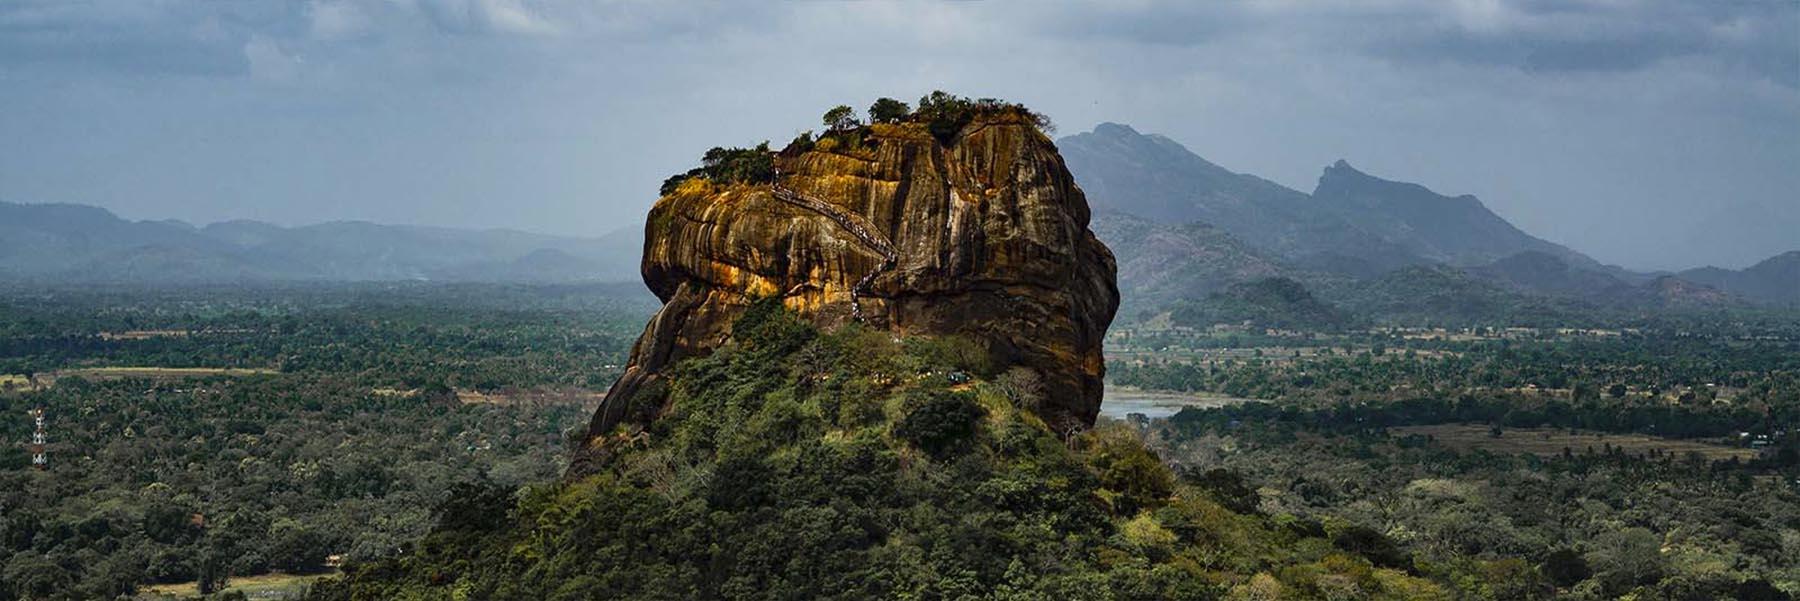 Sri Lanka Tour Packages